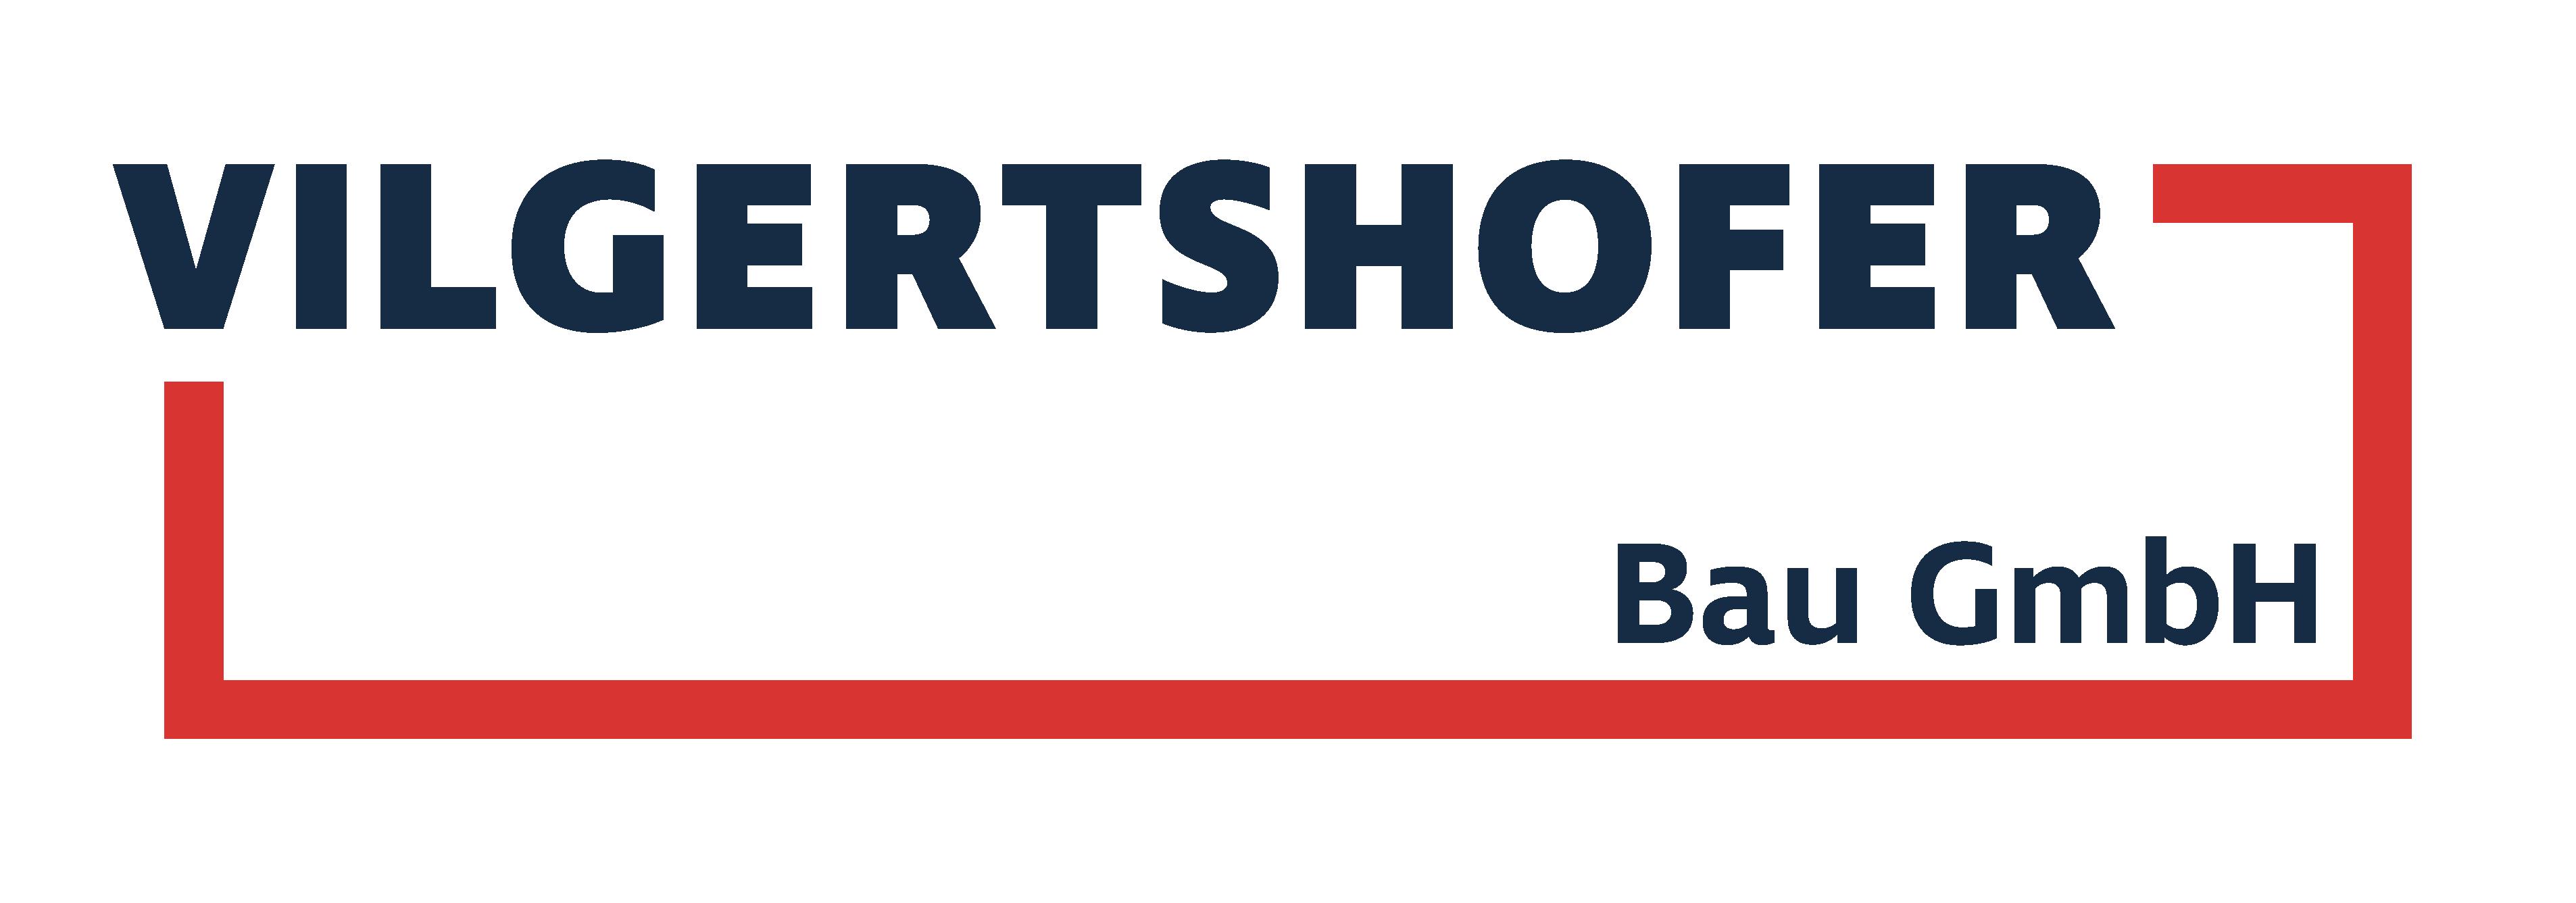 Vilgertshofer Bau GmbH Logo